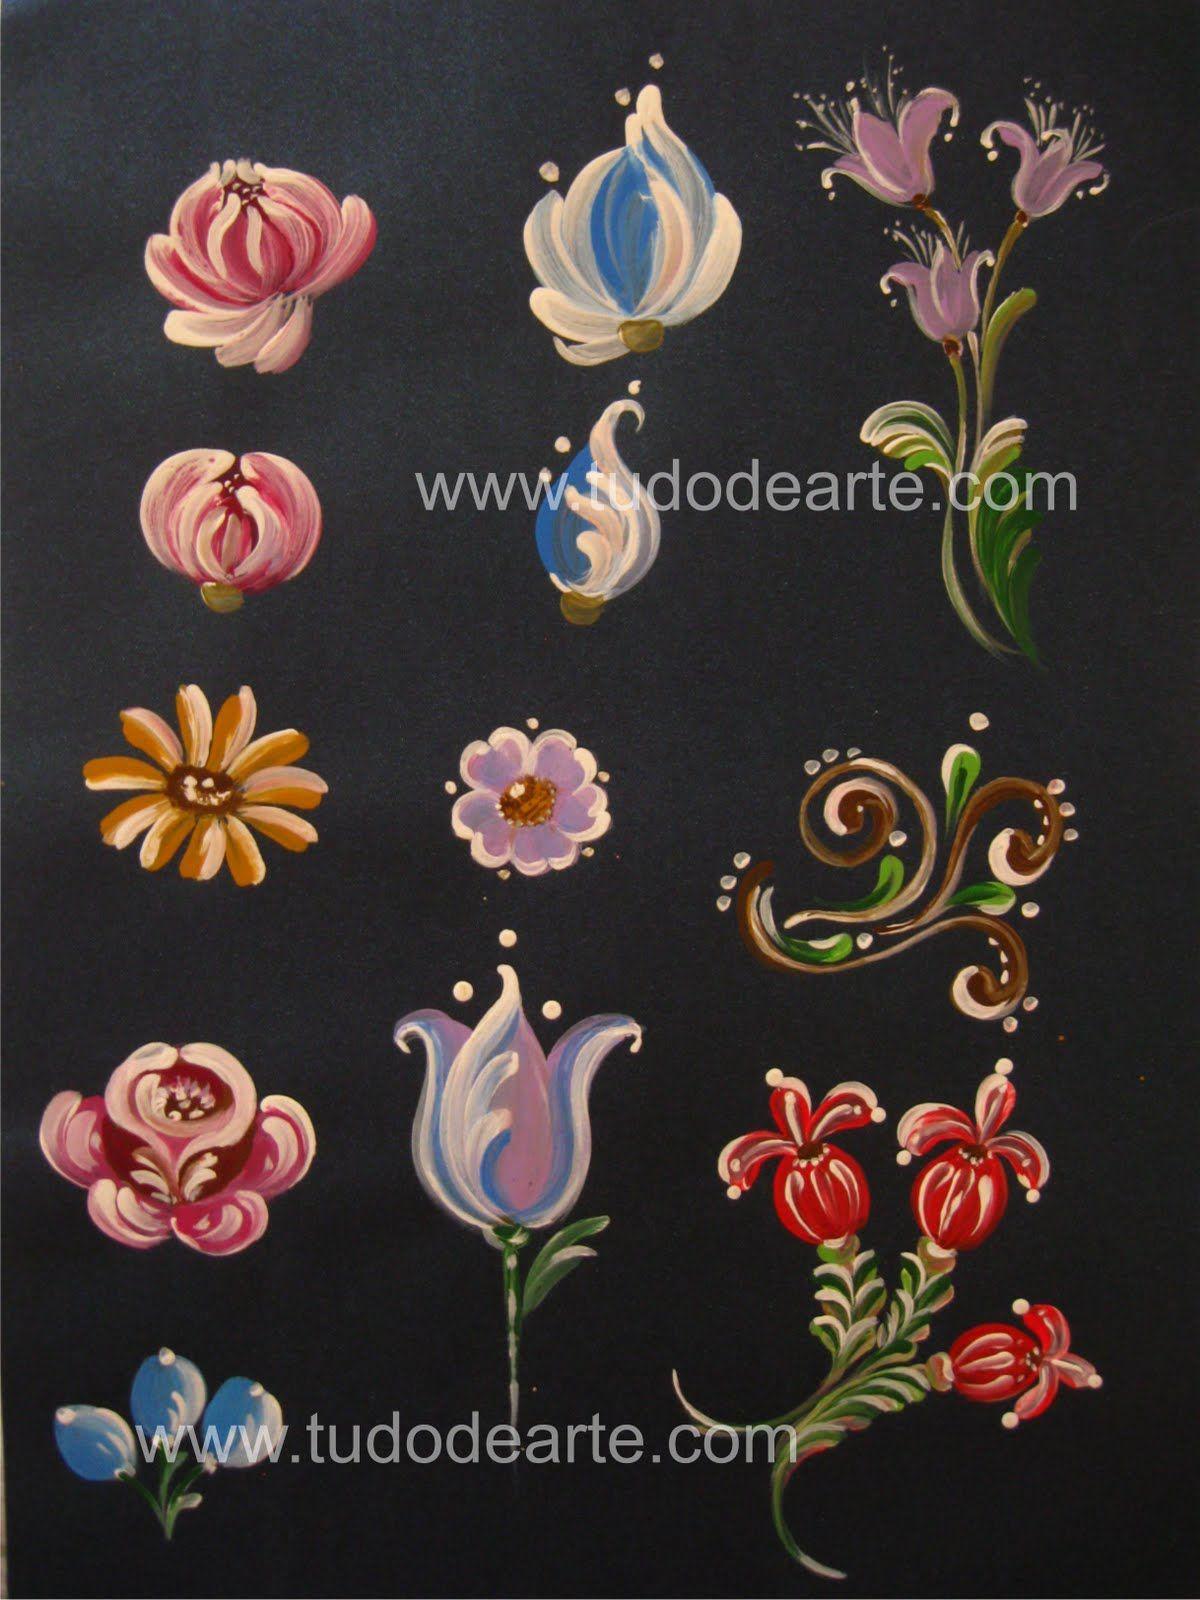 Pintura Bauernmalerei | Bavarian flower painting.  Repinned by www.mygrowingtraditions.com